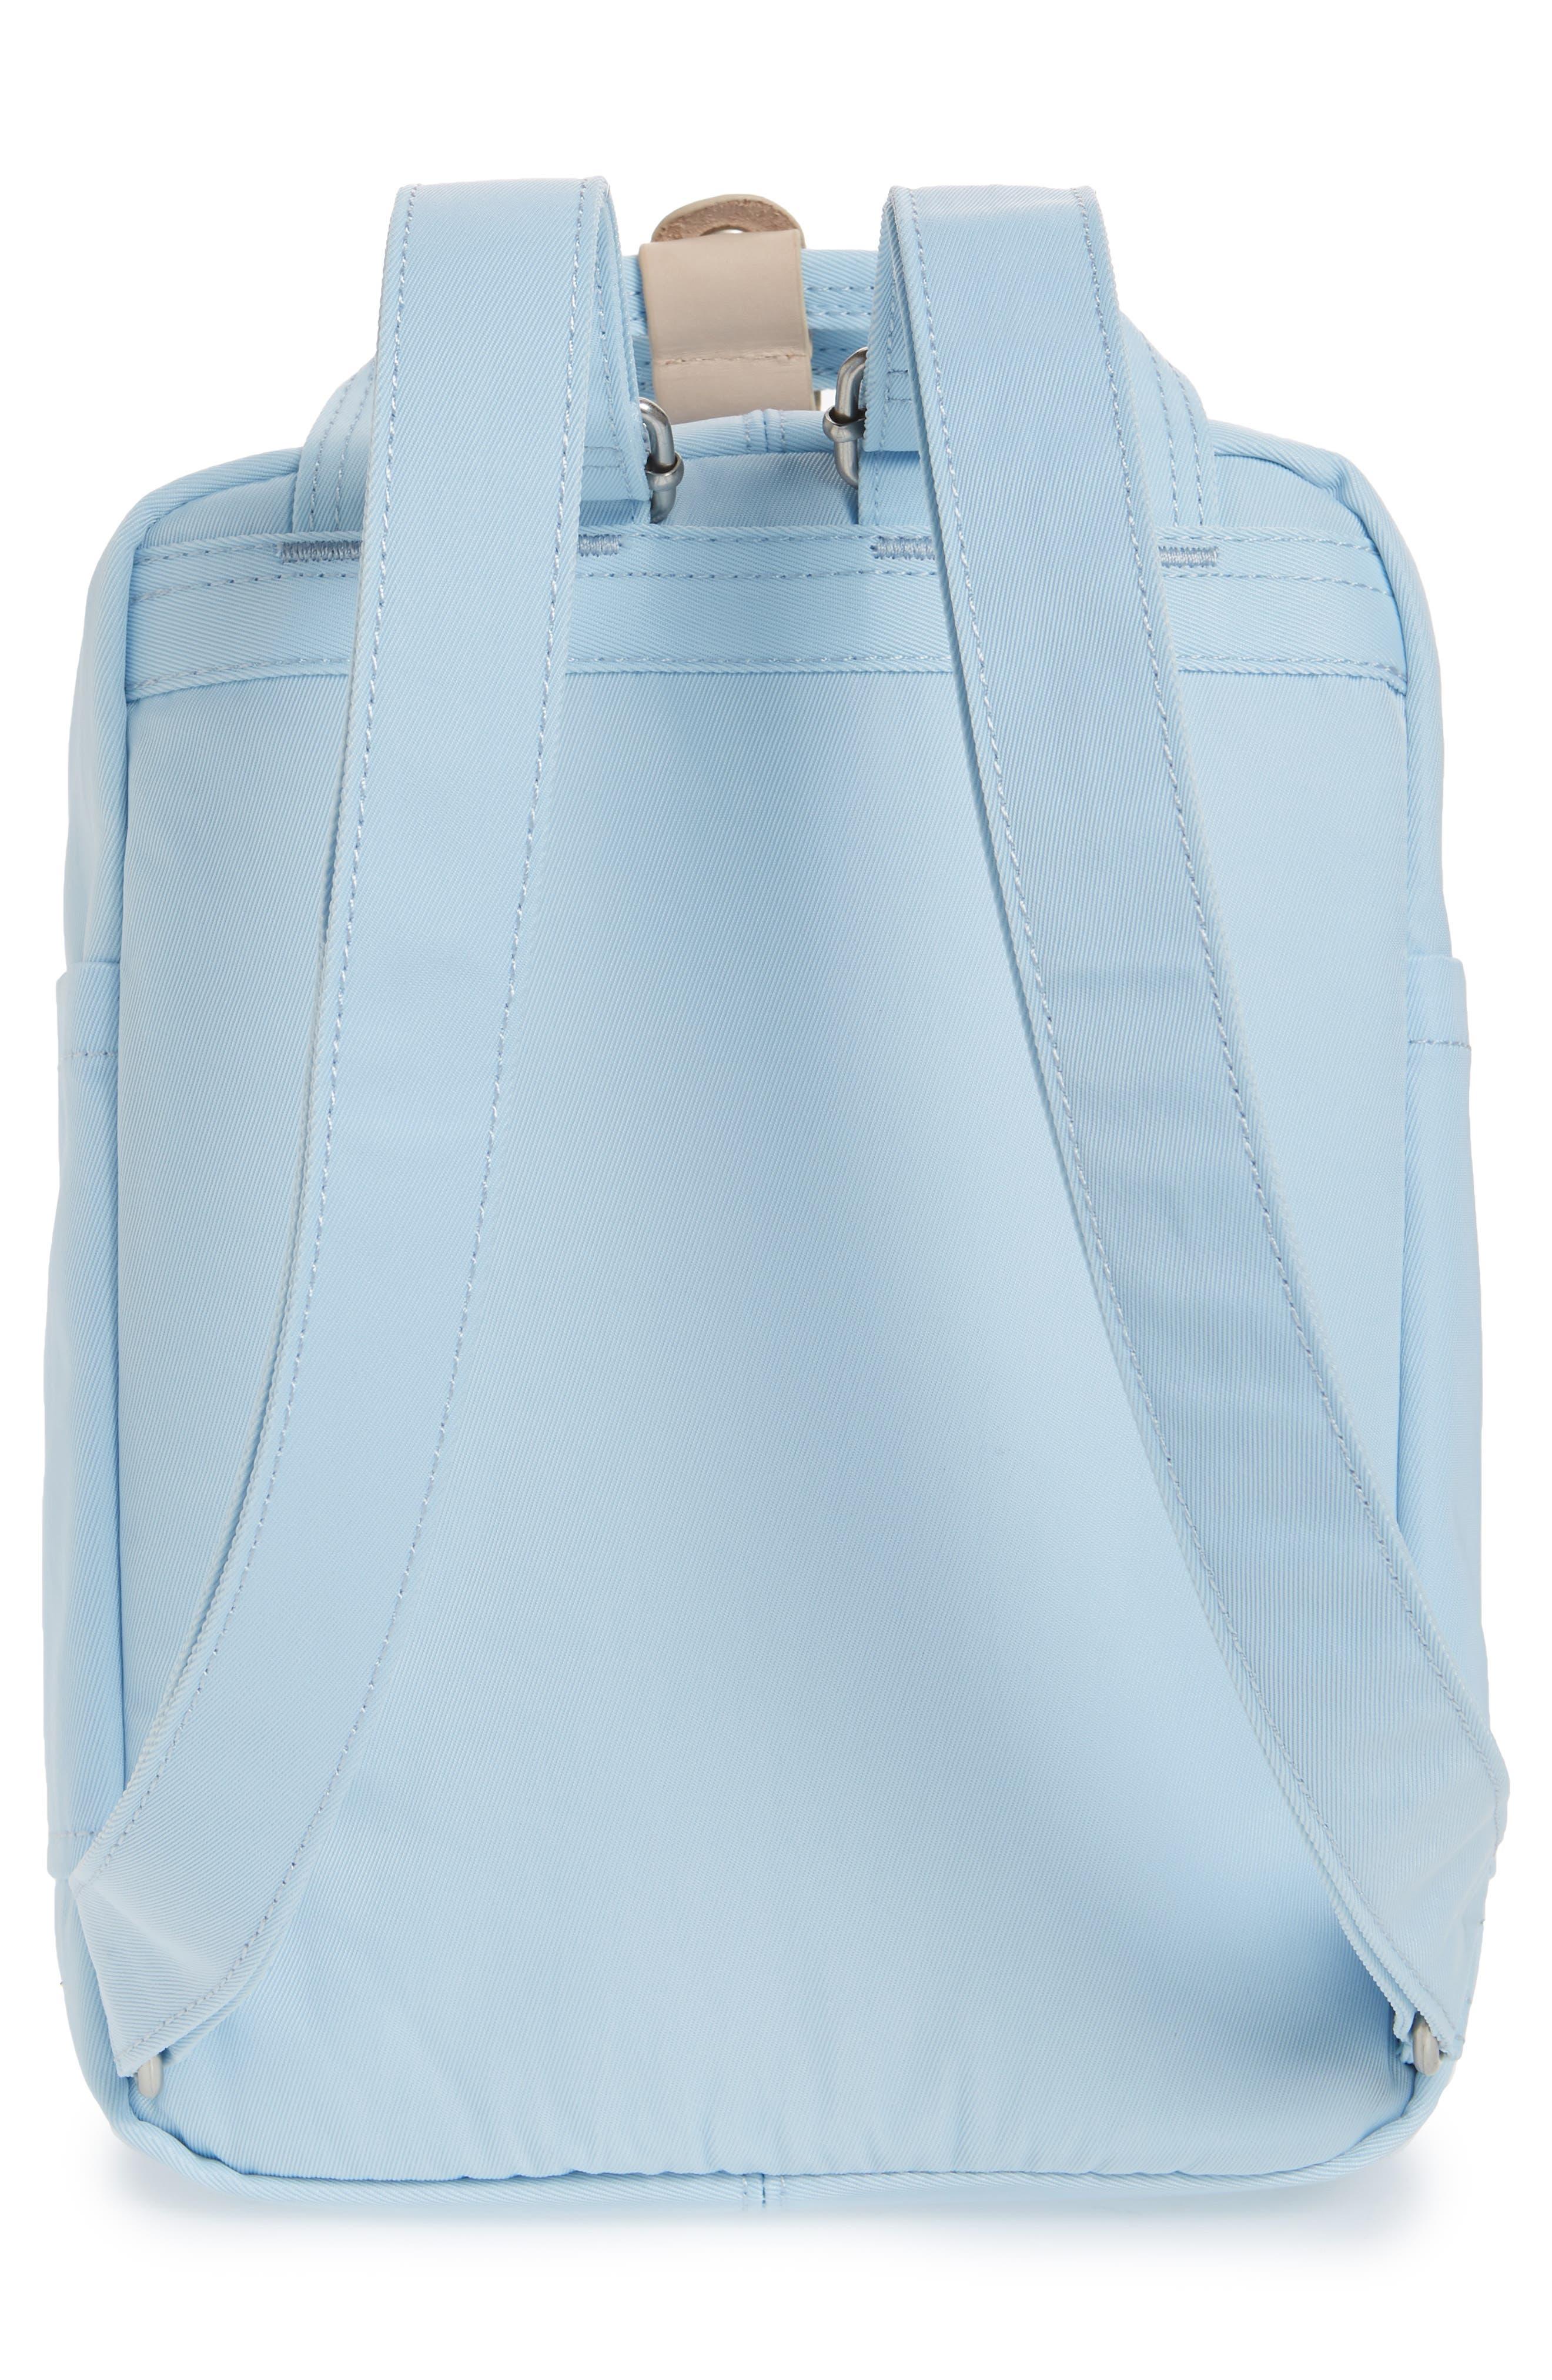 Mini Macaroon Water Resistant Backpack,                             Alternate thumbnail 6, color,                             Iceberg